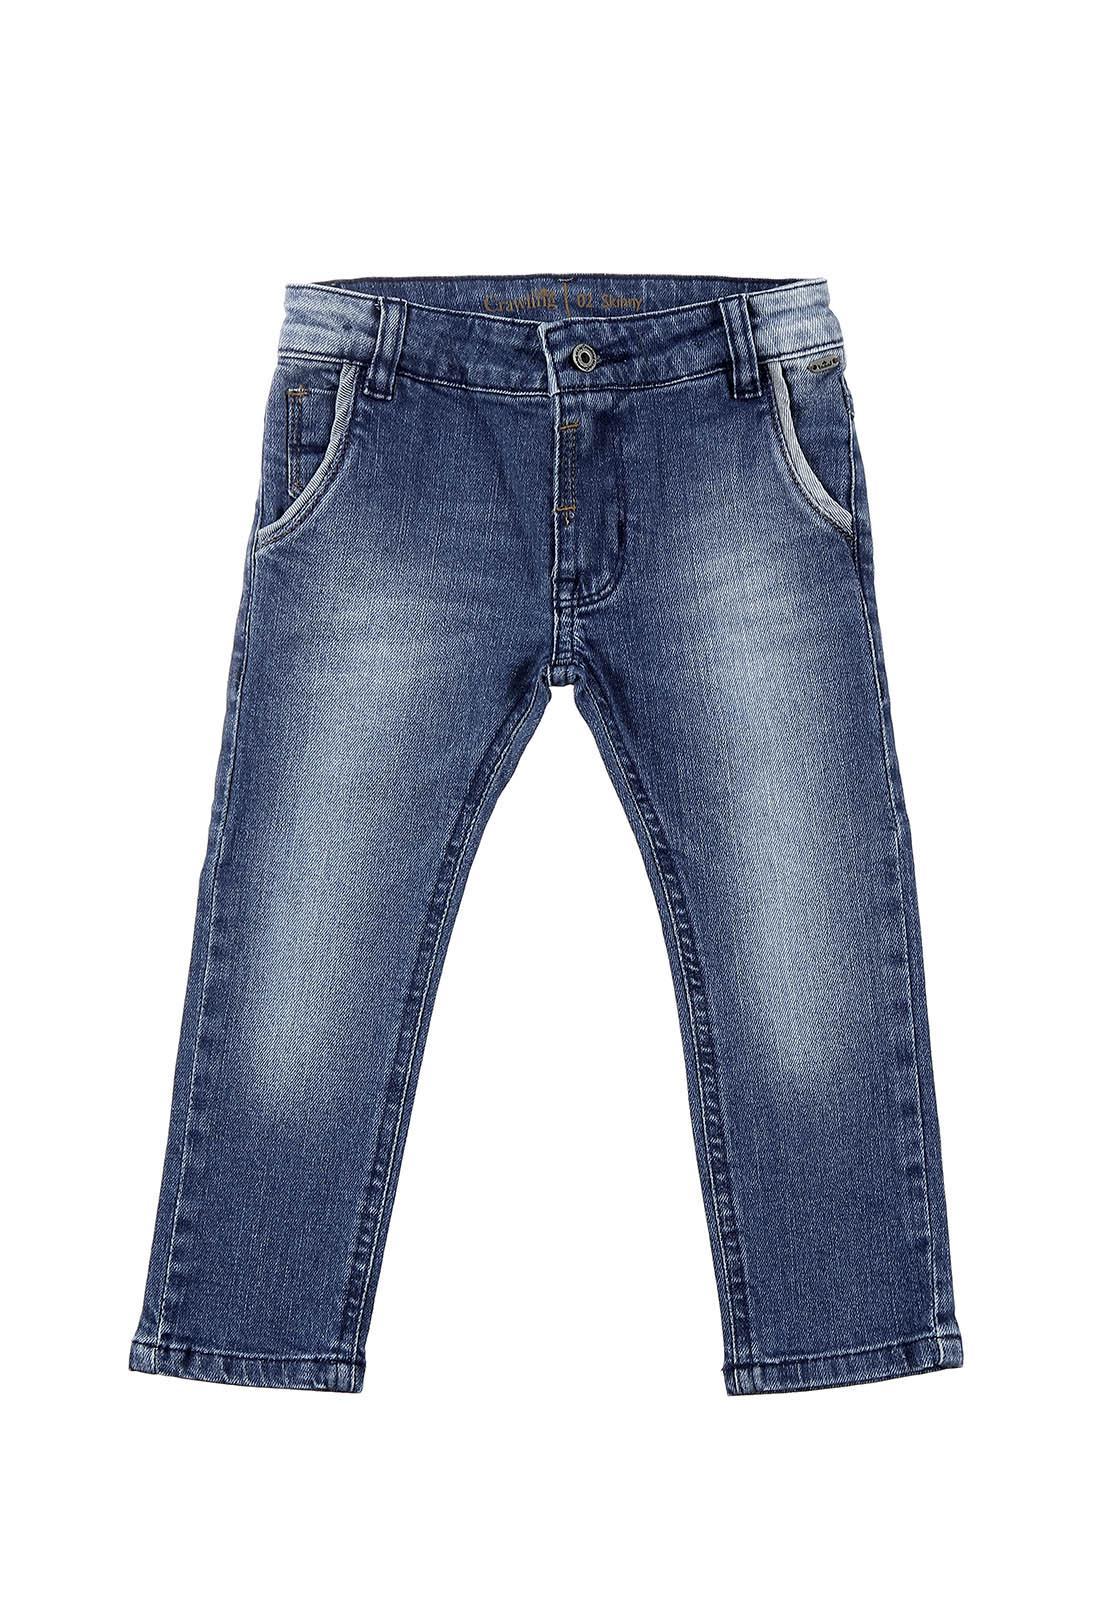 Calça Crawling Jeans Eco Dye Skinny